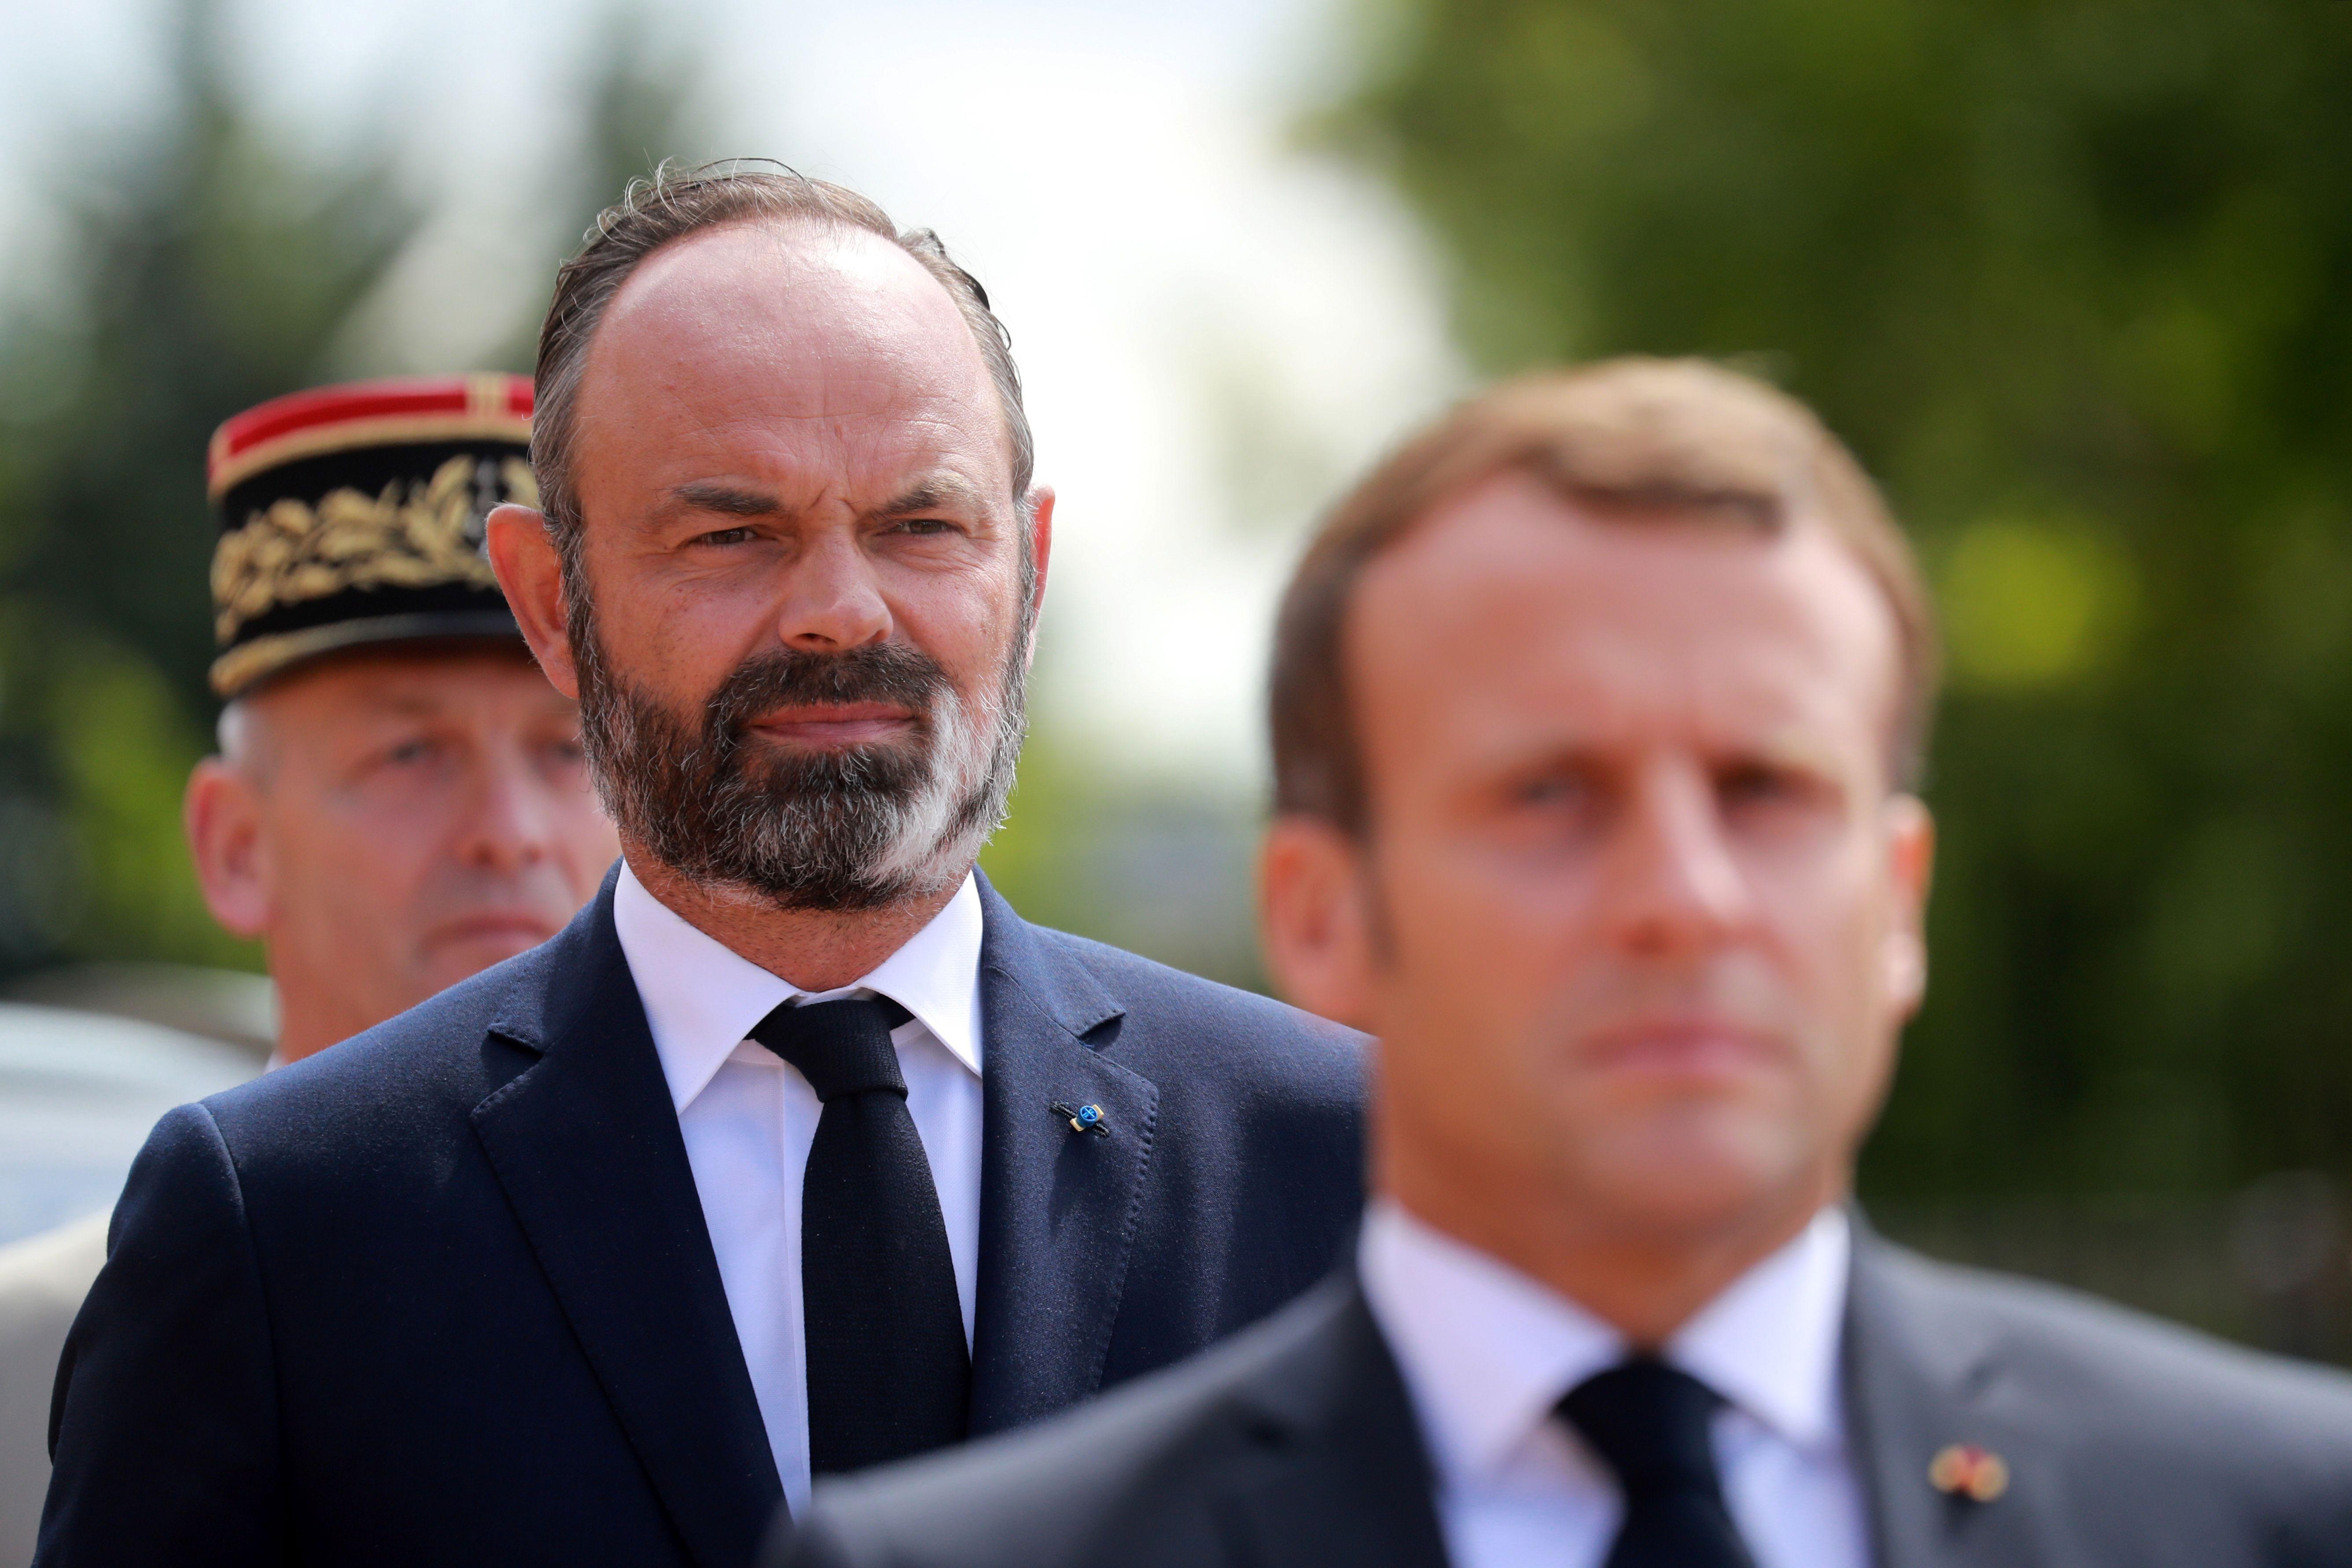 Emmanuel Macron Popularity Poll Lags Pm Edouard Philippe Bloomberg